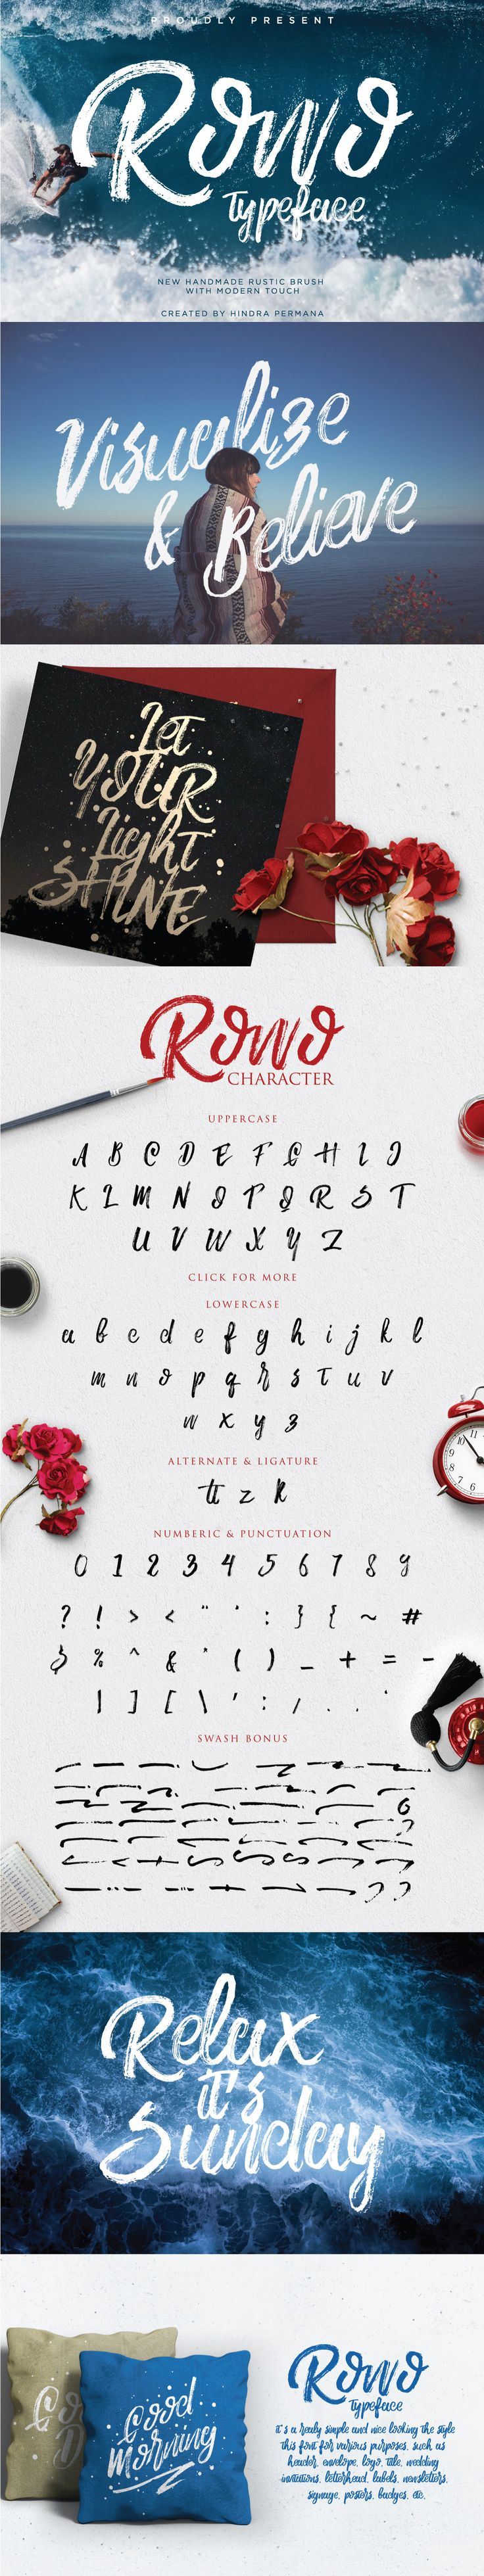 ROWO Free Brush Typeface Commercial Use